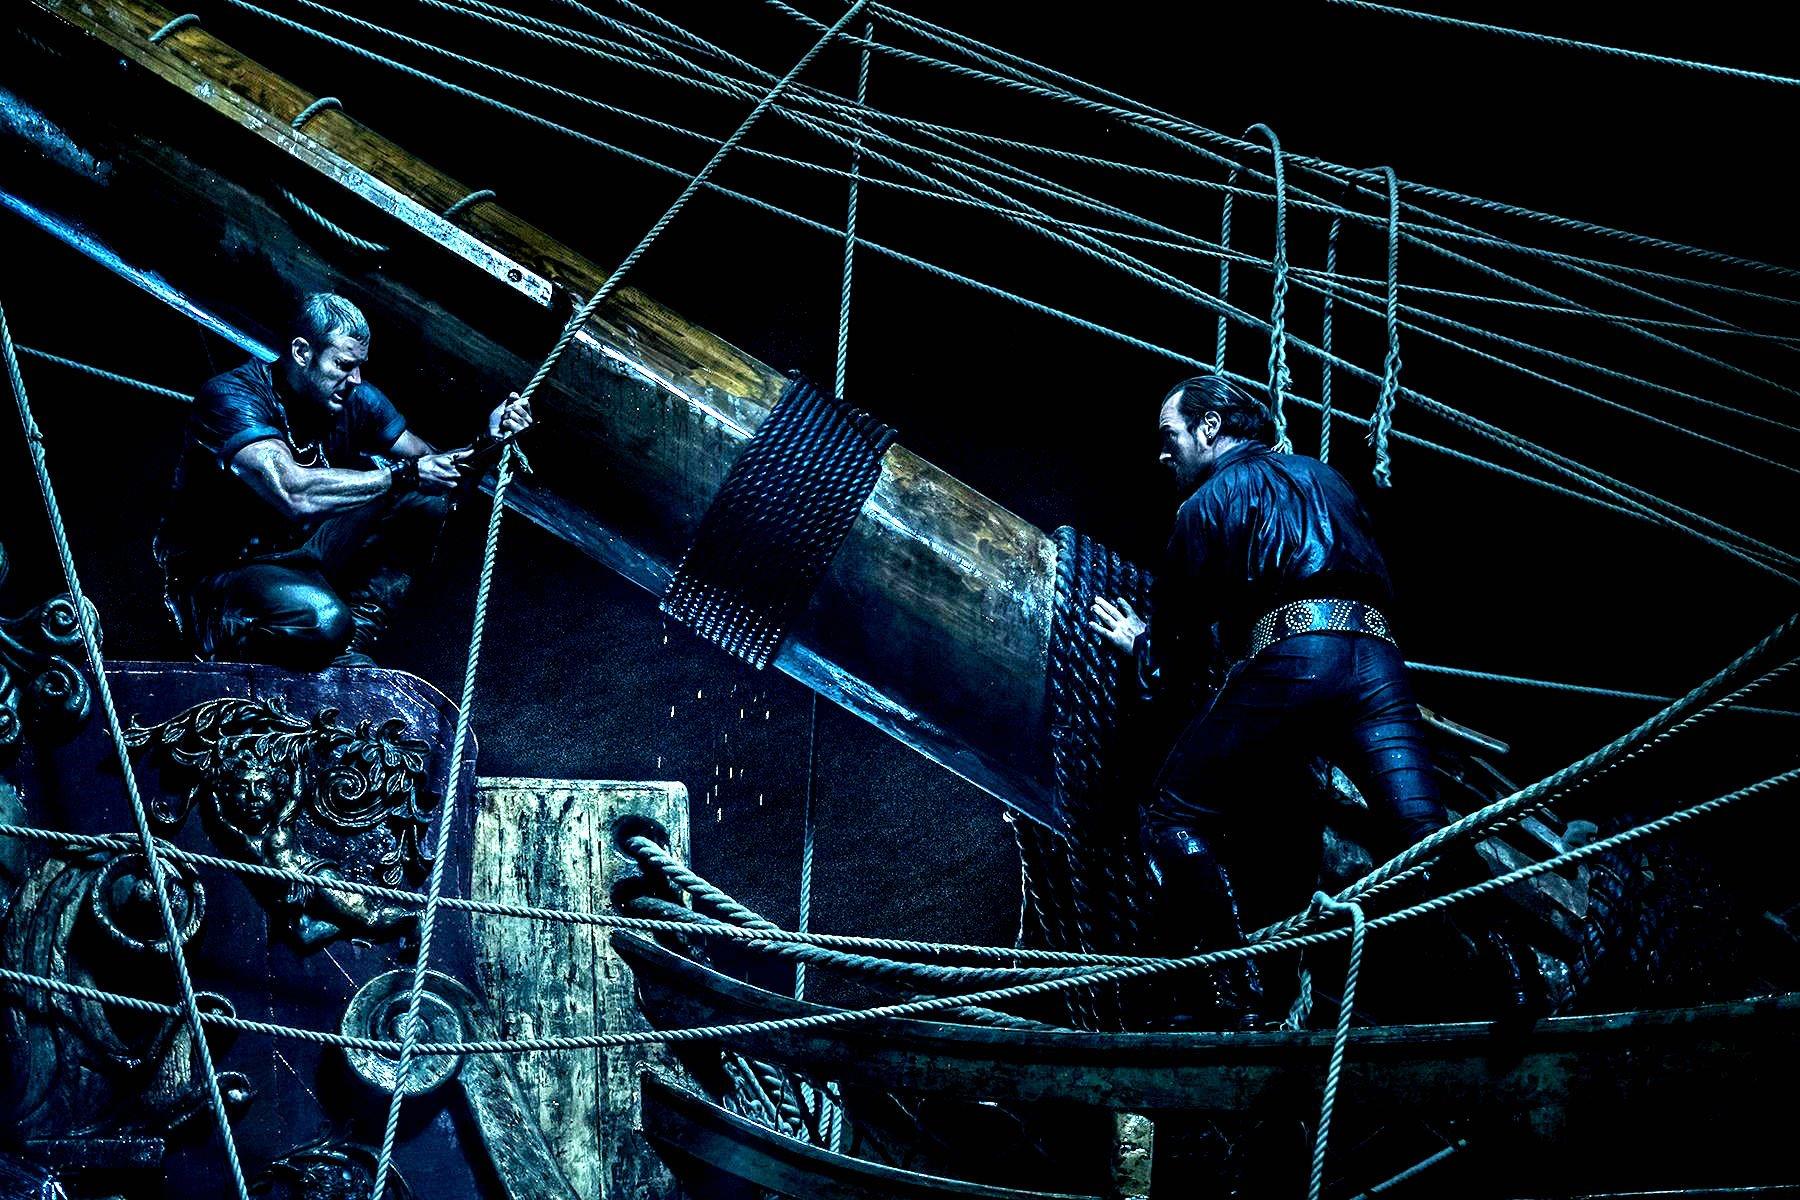 black sails adventure drama fantasy series television pirates pirate starz 1 wallpaper 1800x1200 352238 wallpaperup